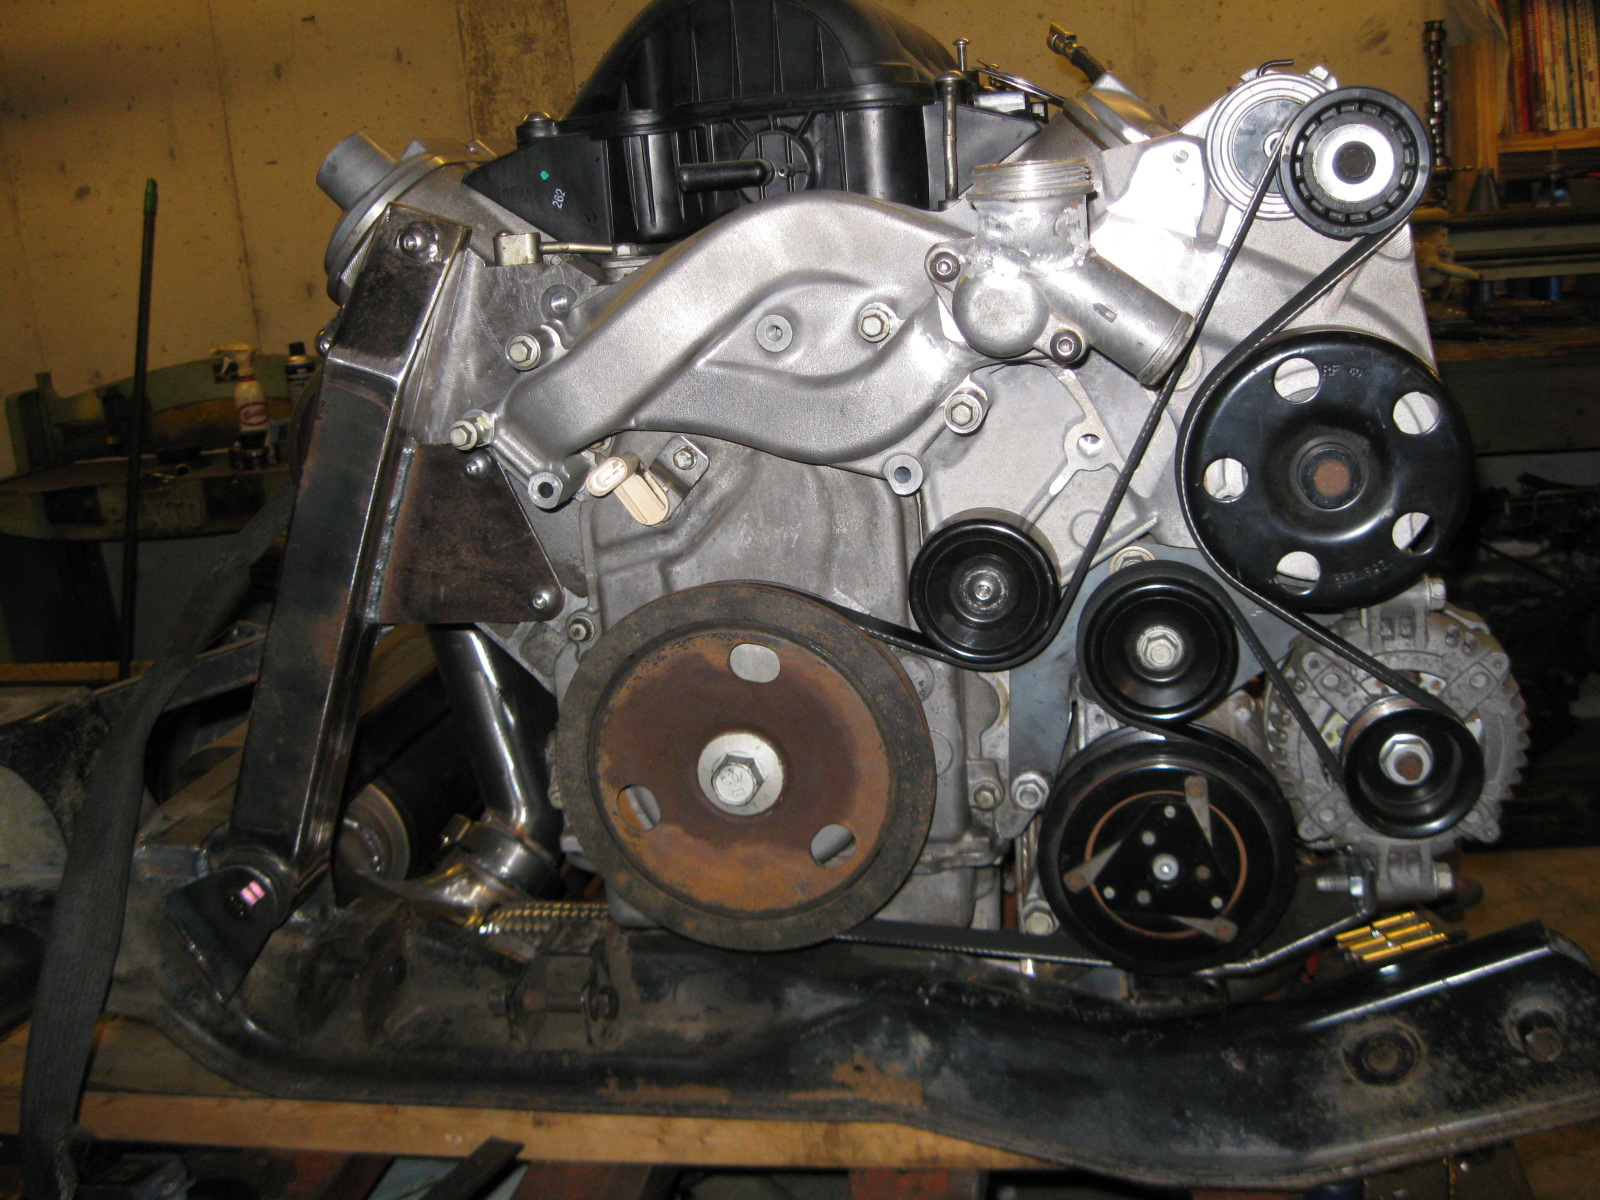 2006 Chevy Truck Wiring Diagram Ls4 F40 E67 Fieroguru Performance Llc